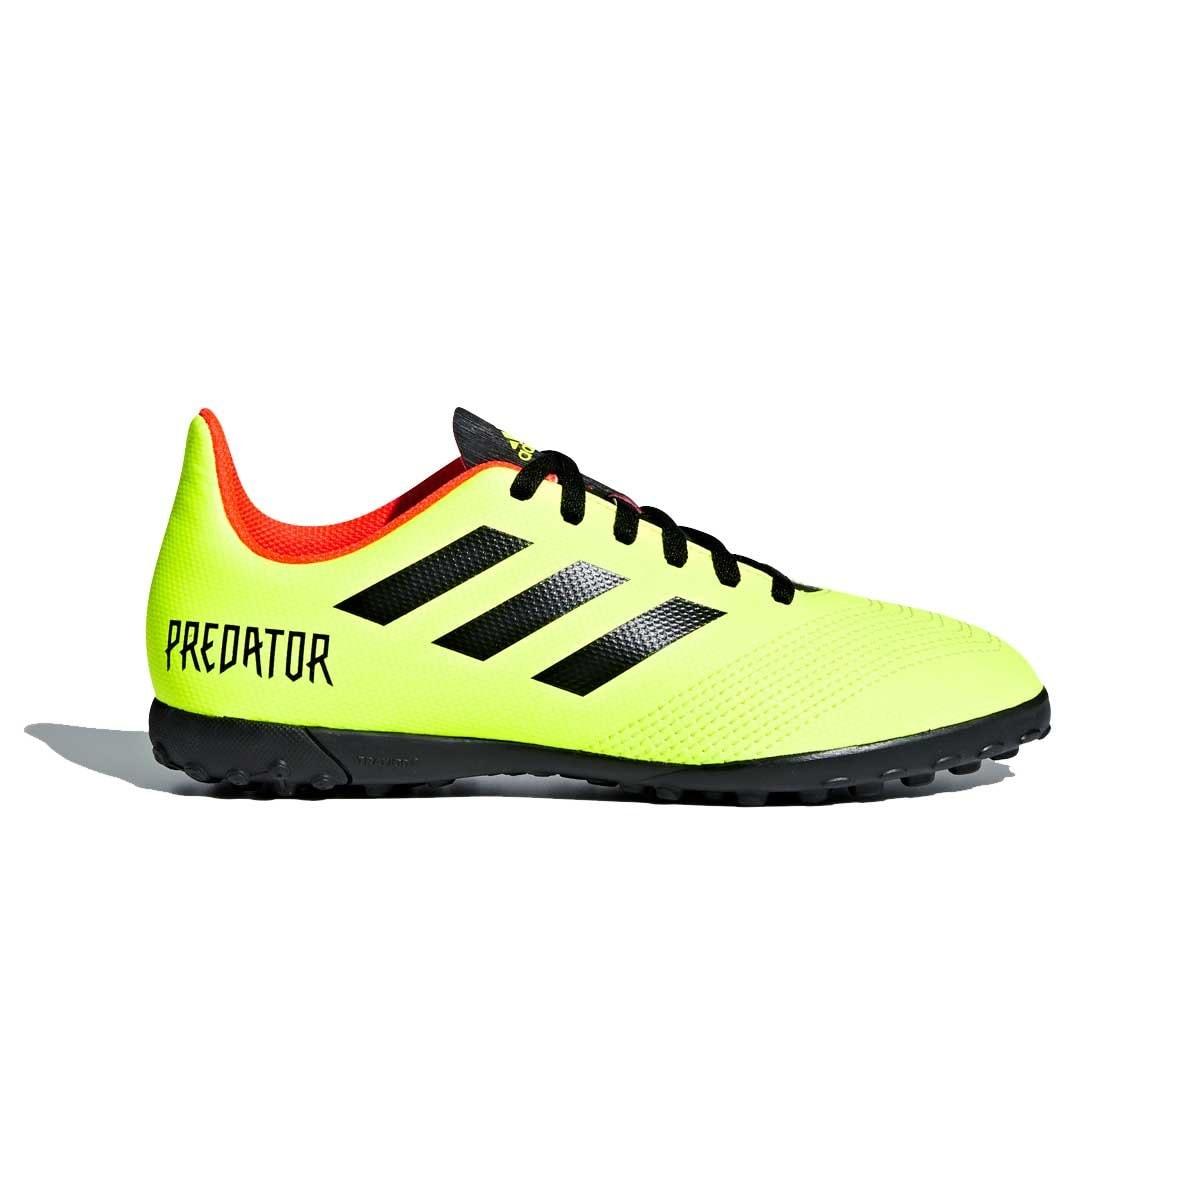 Saqueo bañera Sinewi  Calzado Soccer Predator Tango 18.4 Adidas - Infantil